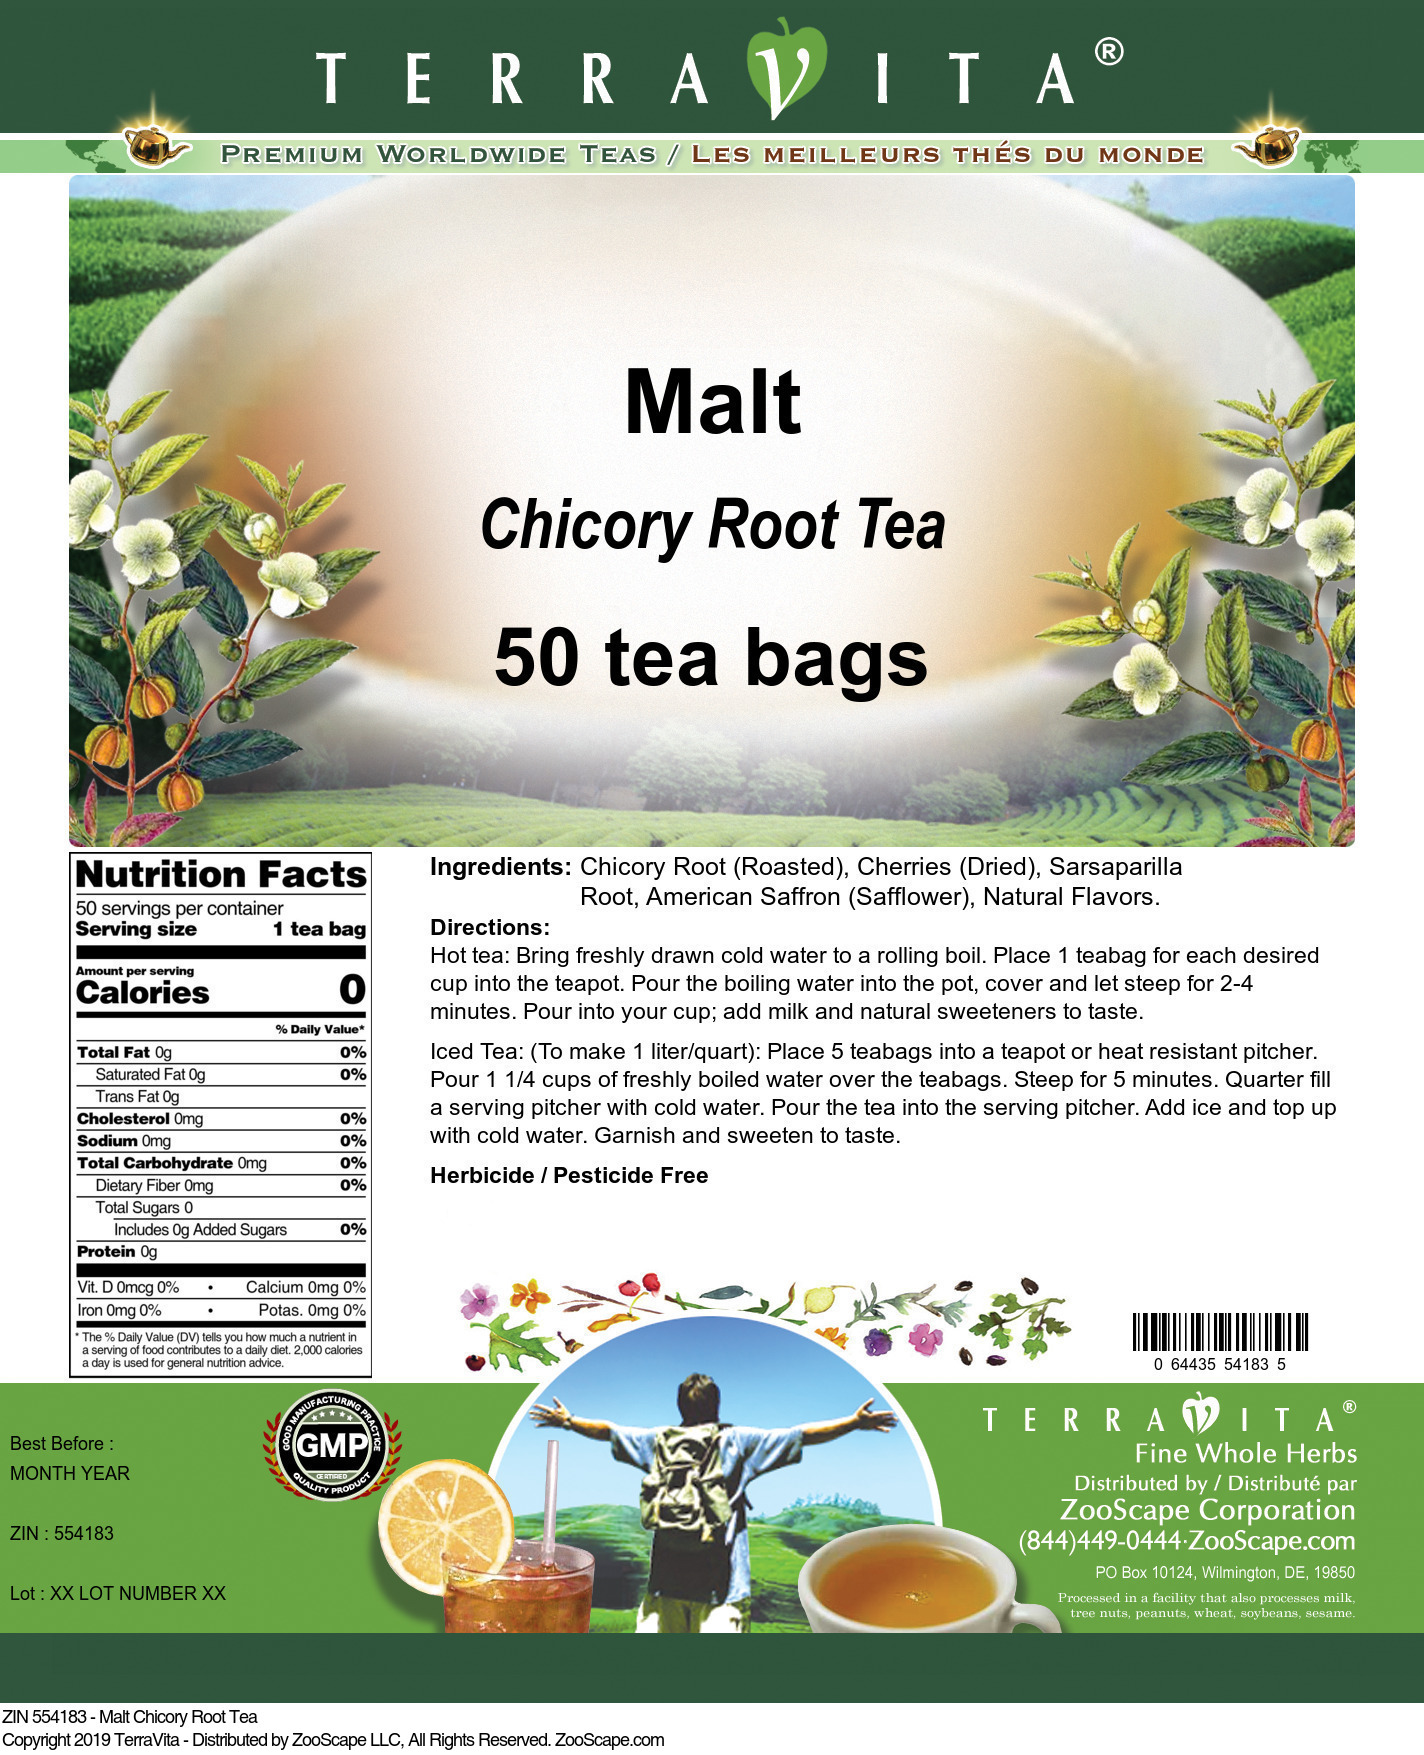 Malt Chicory Root Tea